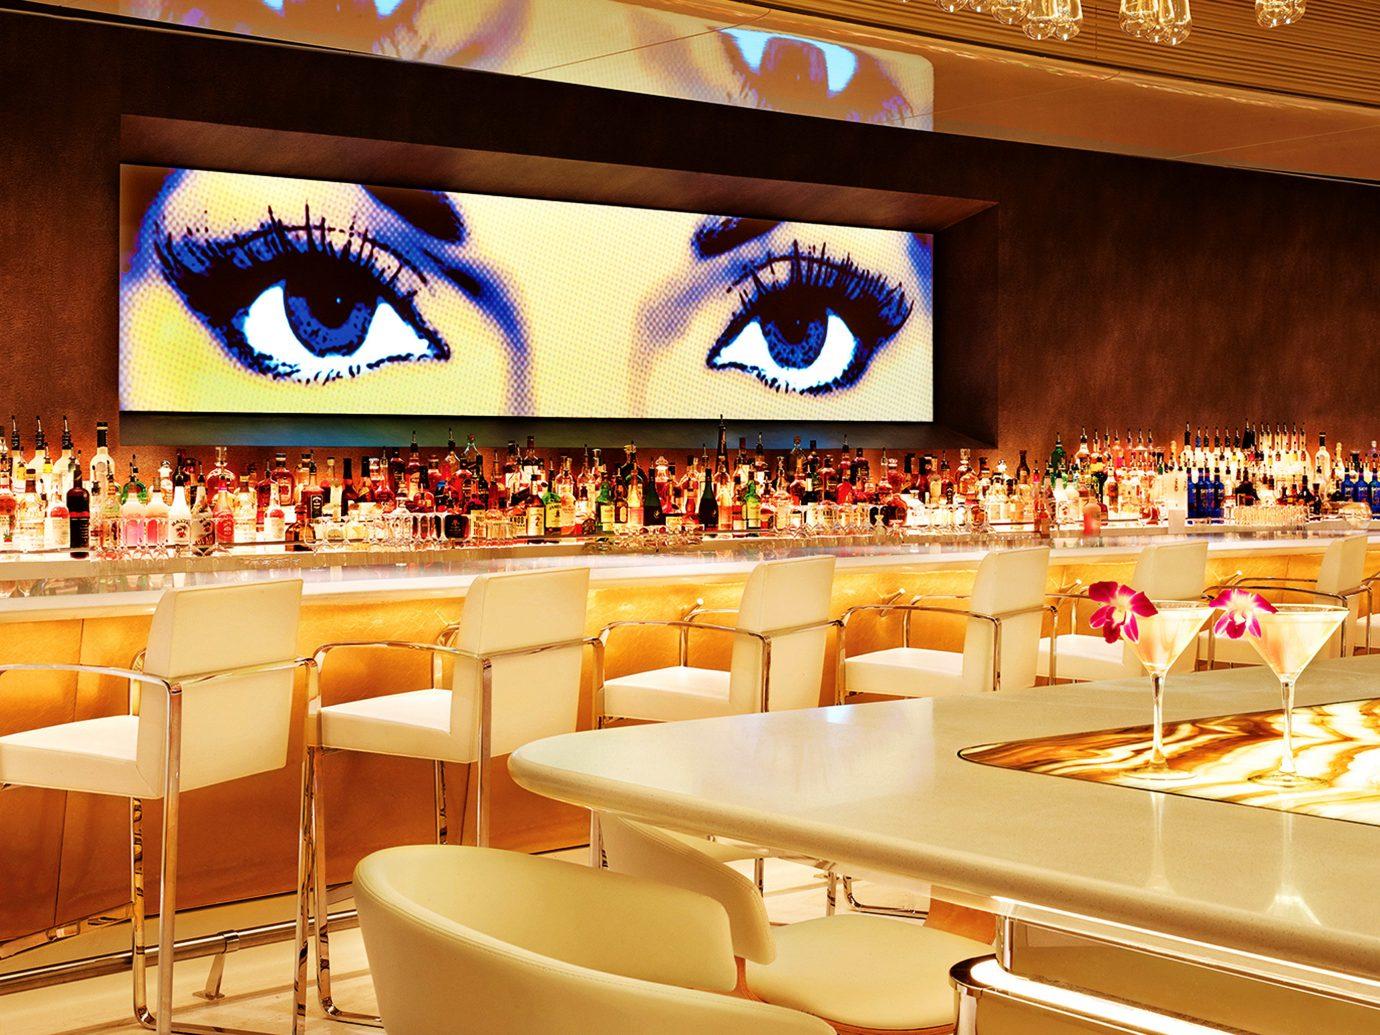 Bar Budget Casino City Drink Entertainment Luxury table indoor function hall meal restaurant interior design conference hall auditorium ballroom